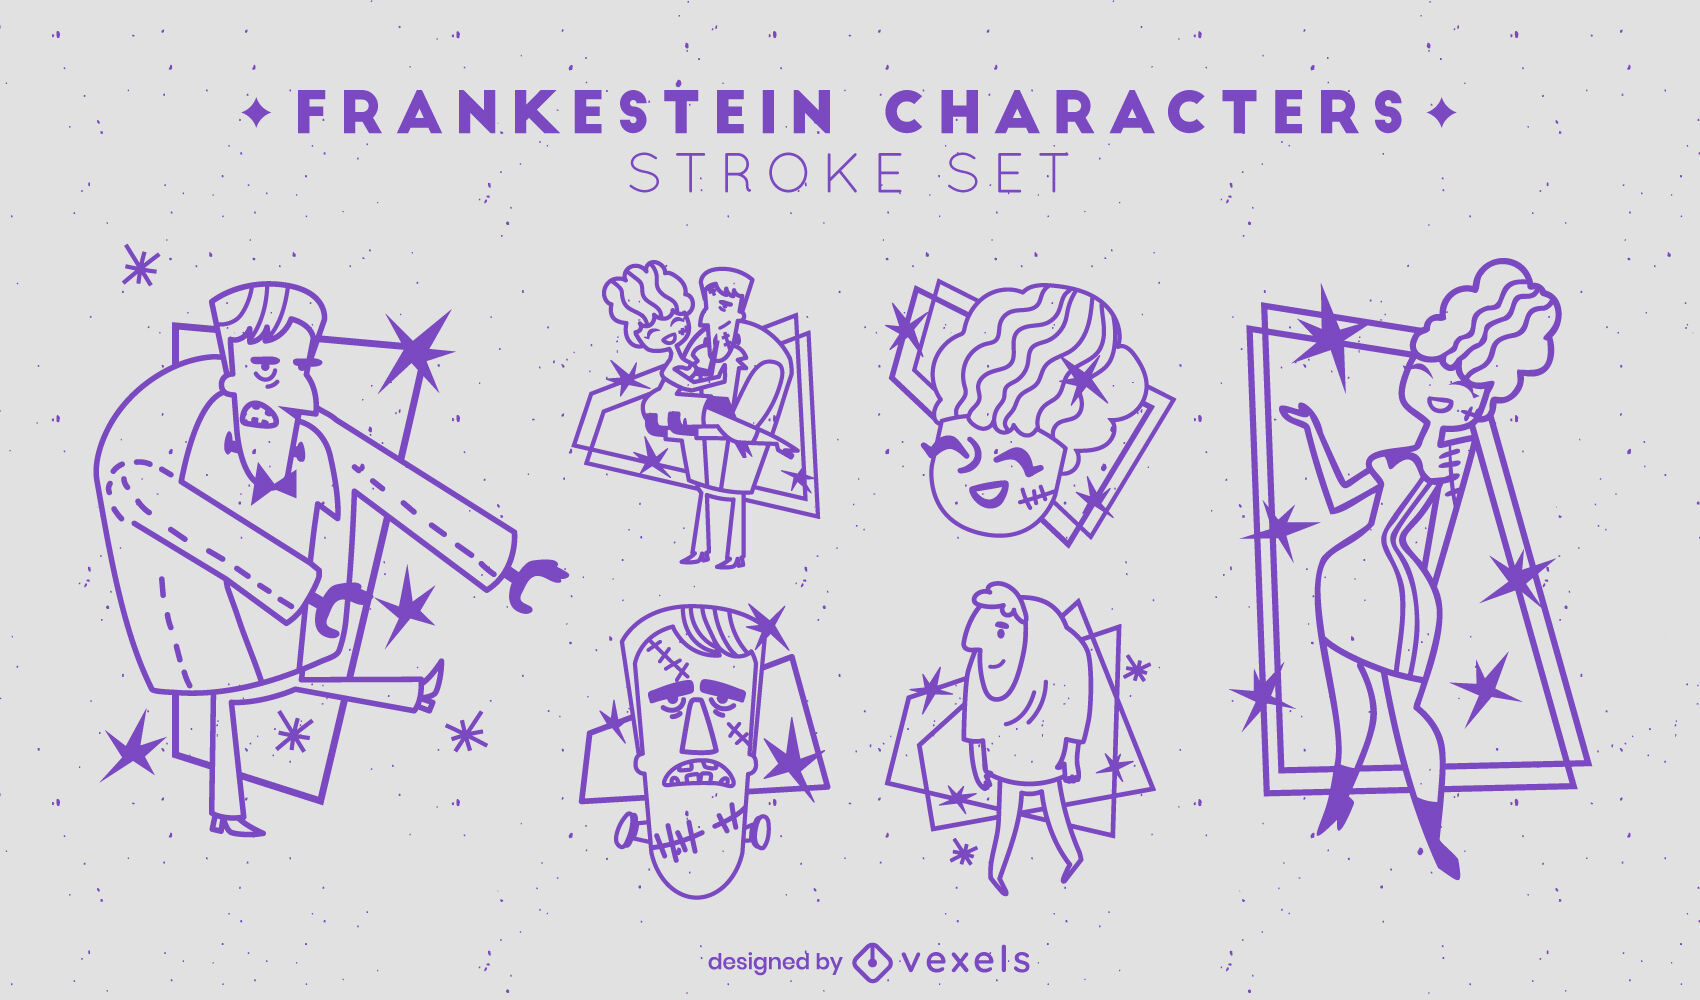 Frankenstein stroke characters set